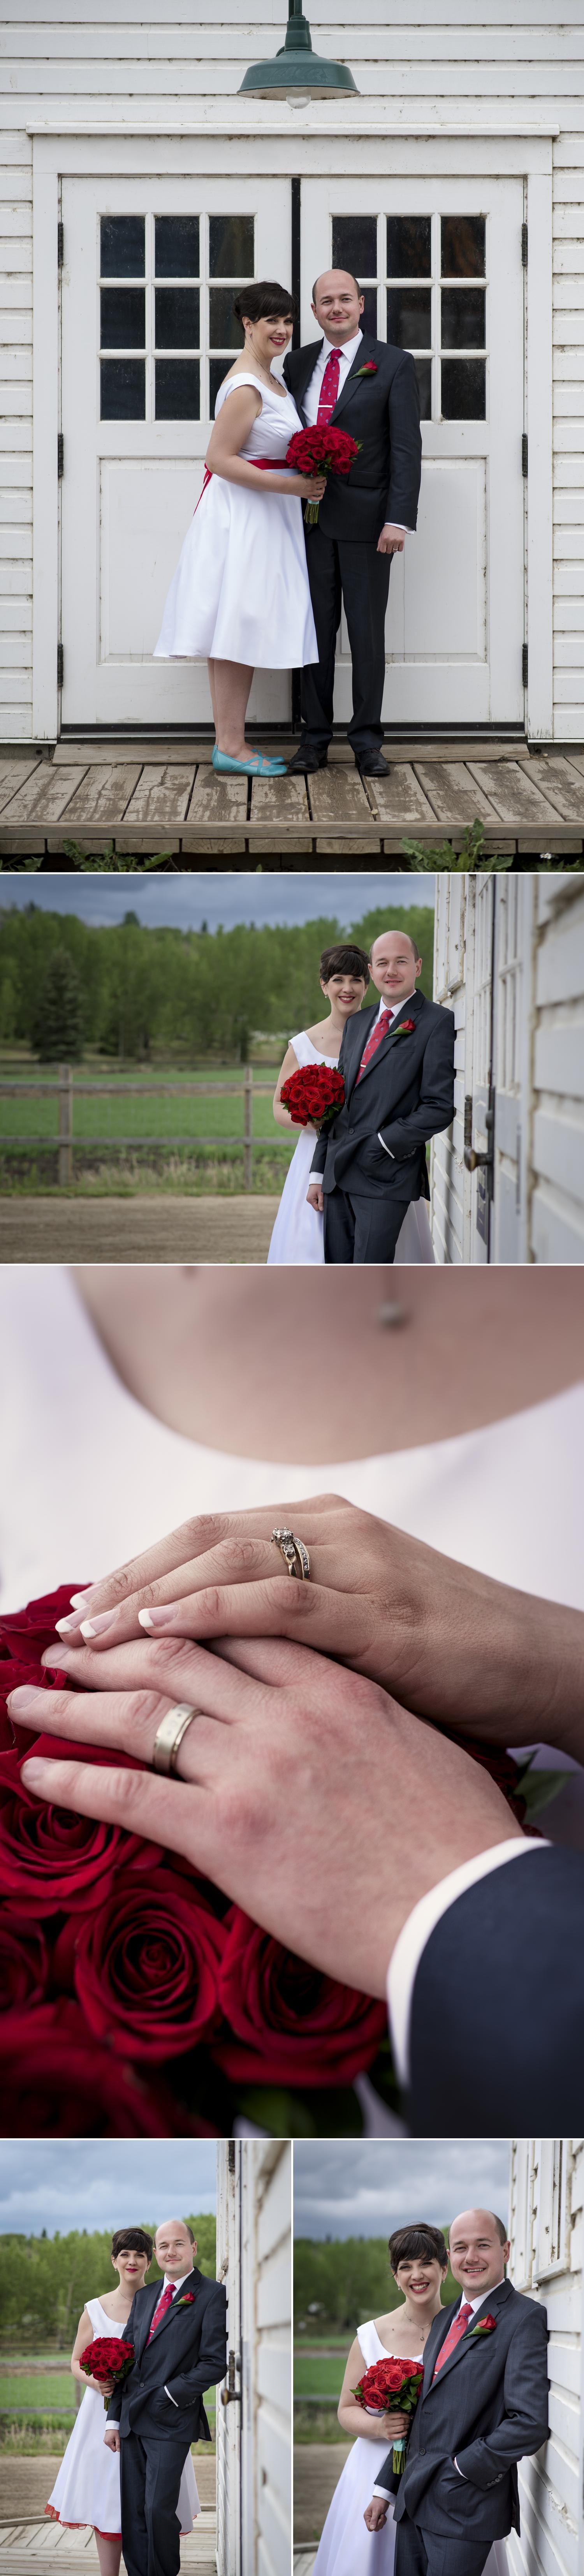 Wedding at Fort Edmonton Park, Edmonton, Alberta, Canada. Photography by Friday Design + Photography from Edmonton, Alberta, Canada